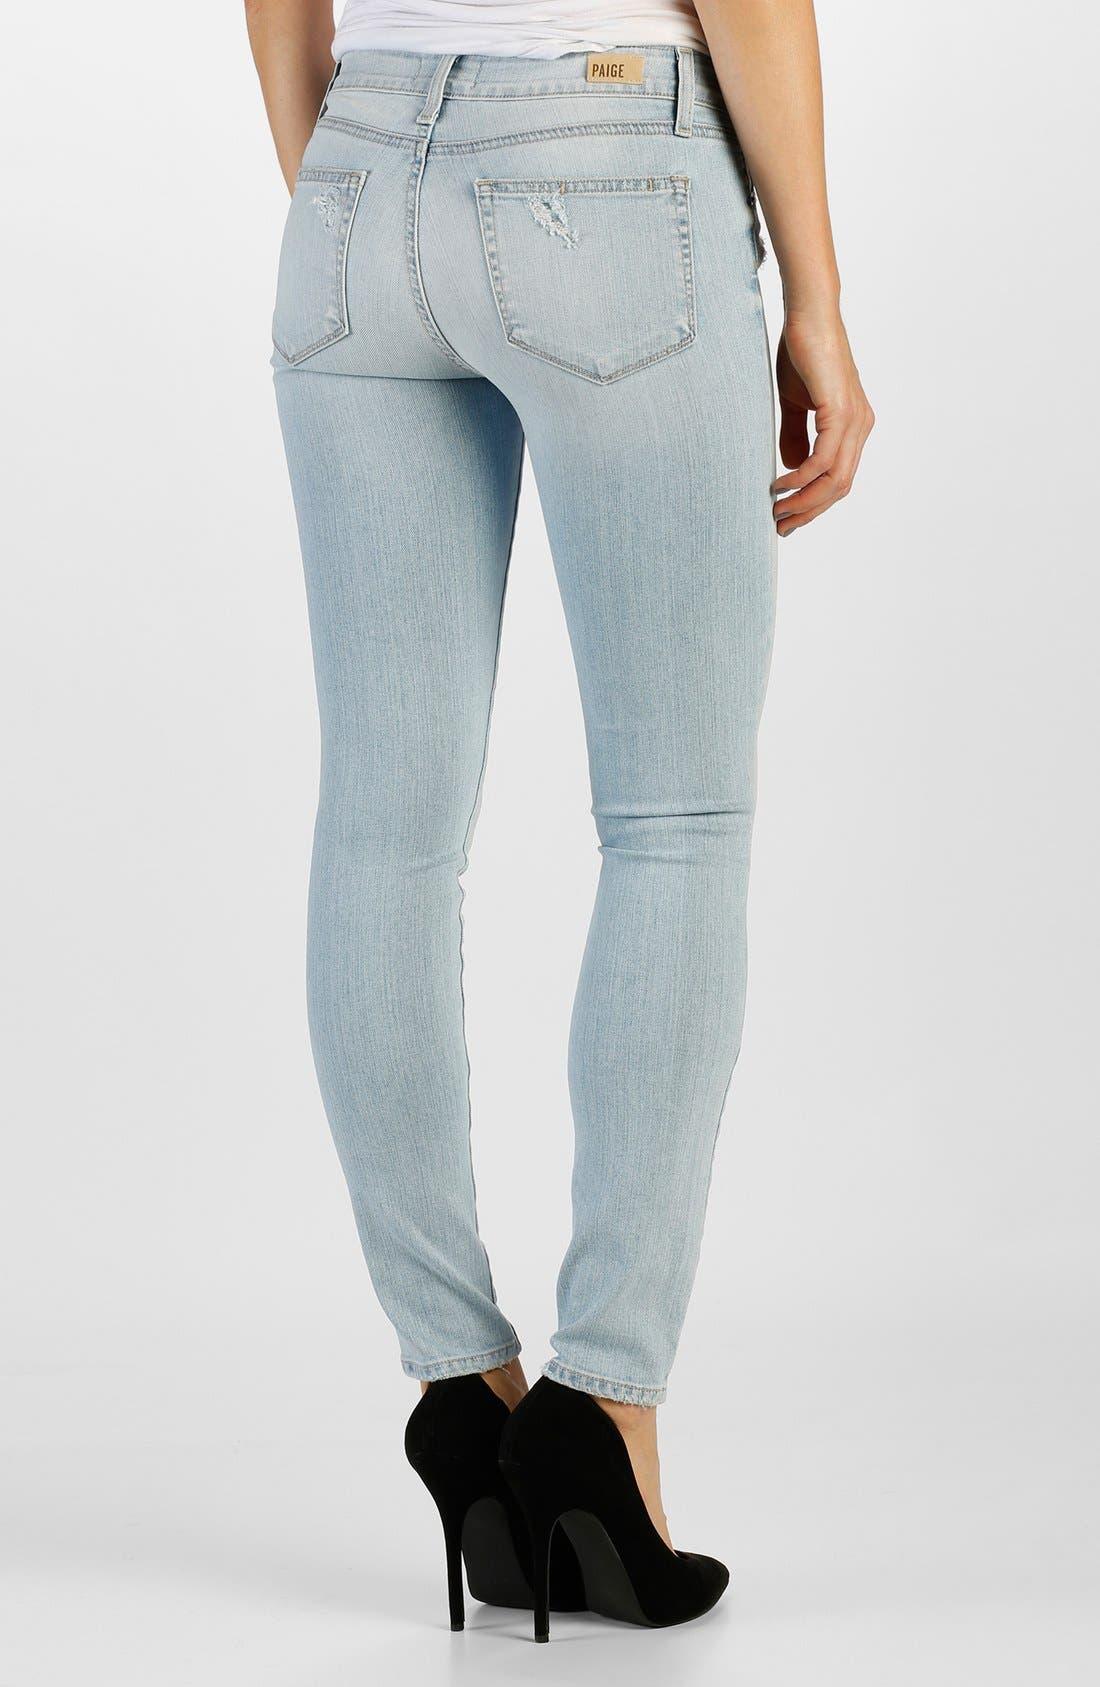 Alternate Image 2  - Paige Denim 'Verdugo' Ultra Skinny Jeans (Harriet Destructed)